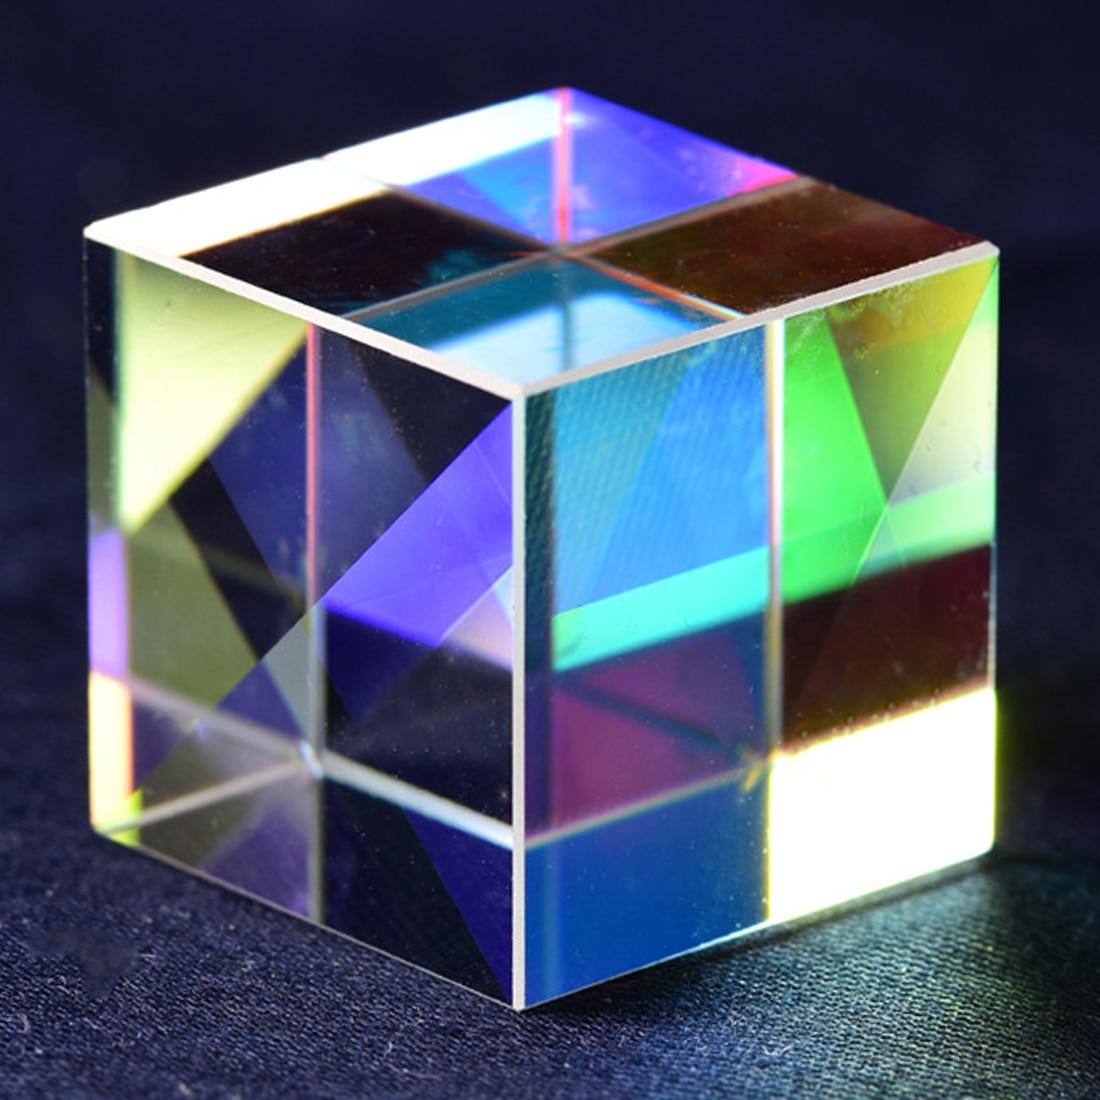 Transparent Module Optical Glass Toy K9 Cube Prism Defective Cross Dichroic Mirror Combiner Splitter Decor 18*18mm